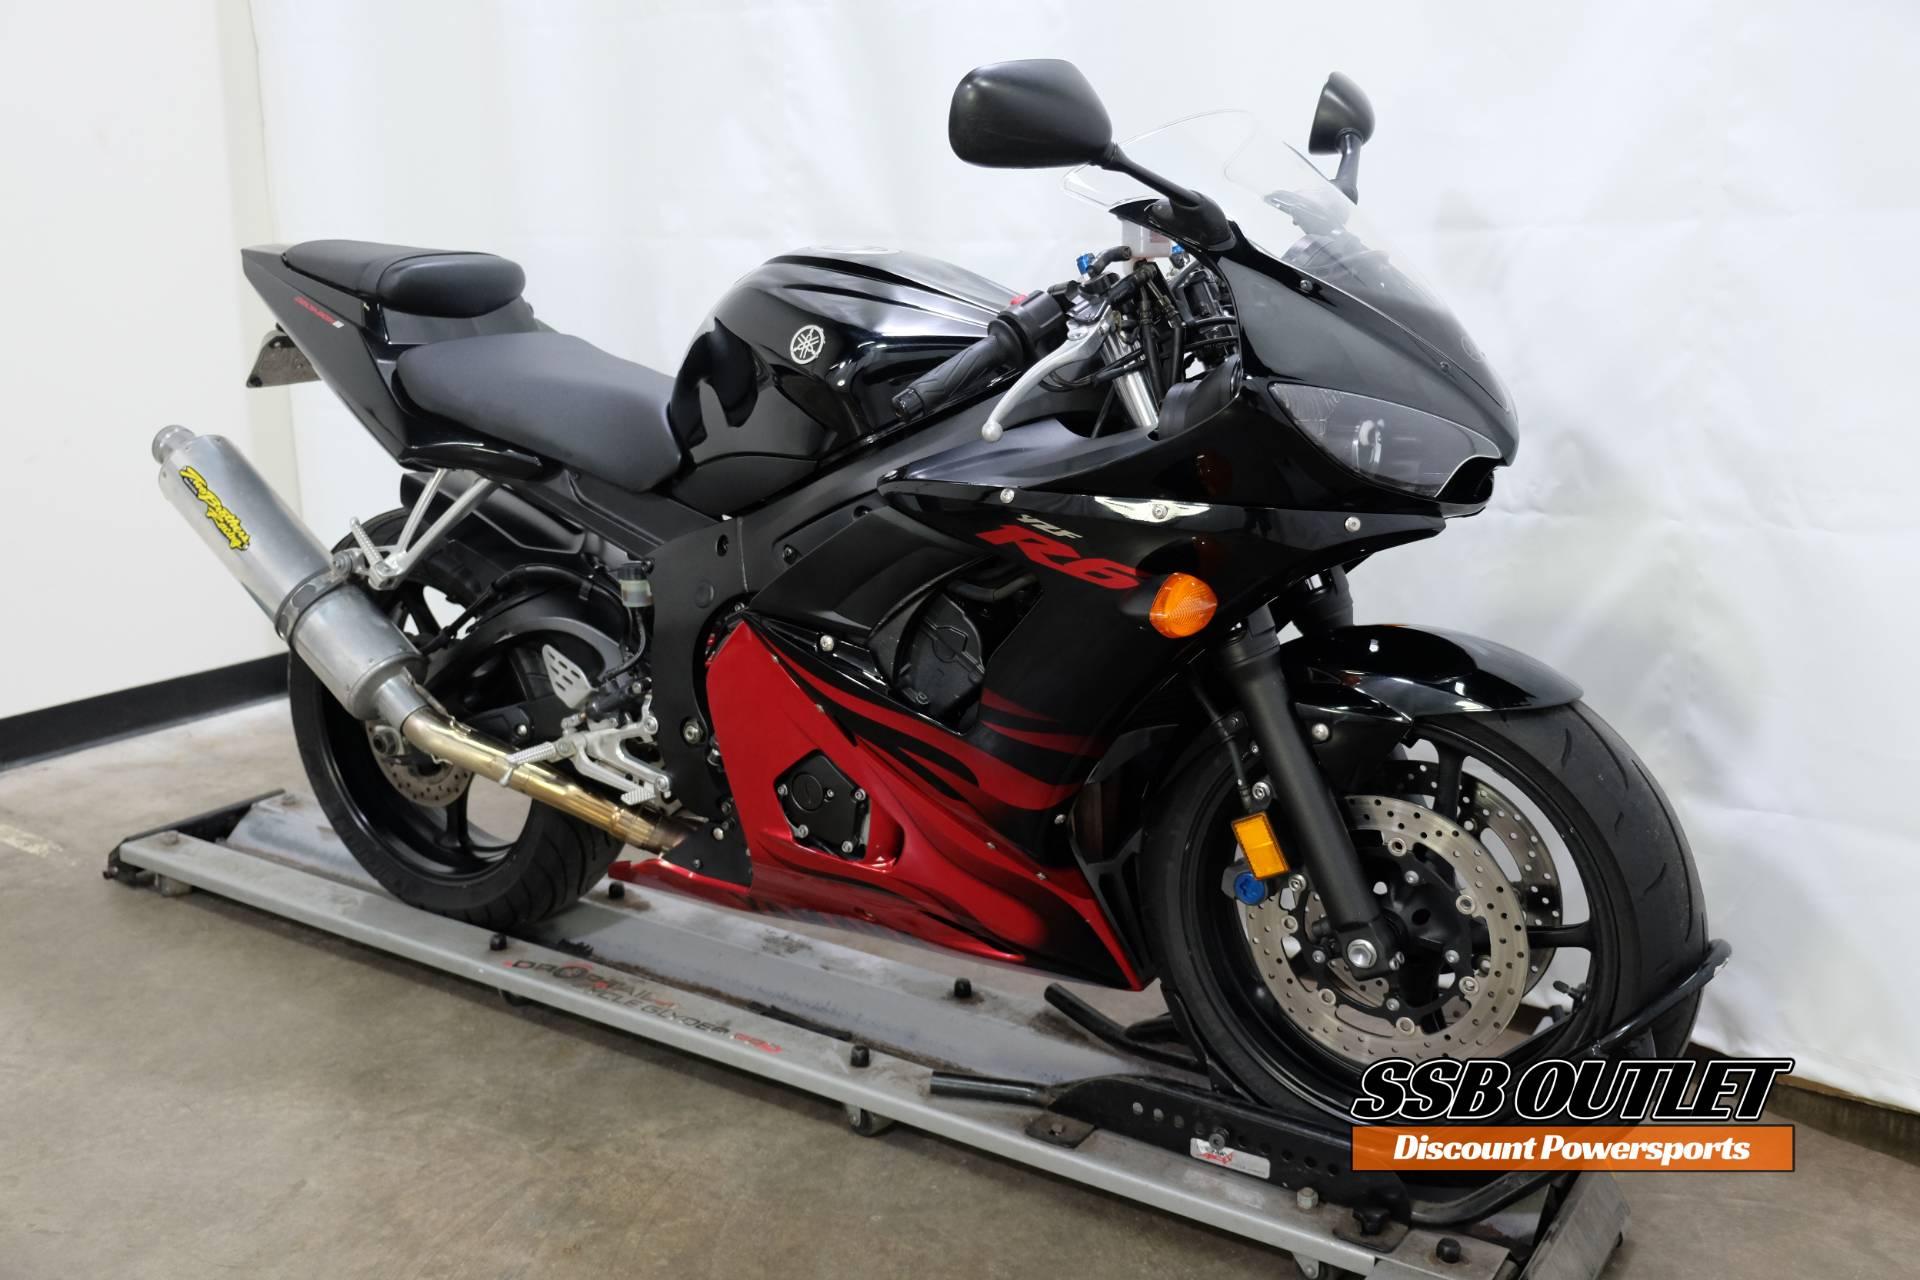 2003 Yamaha YZF-R6 1